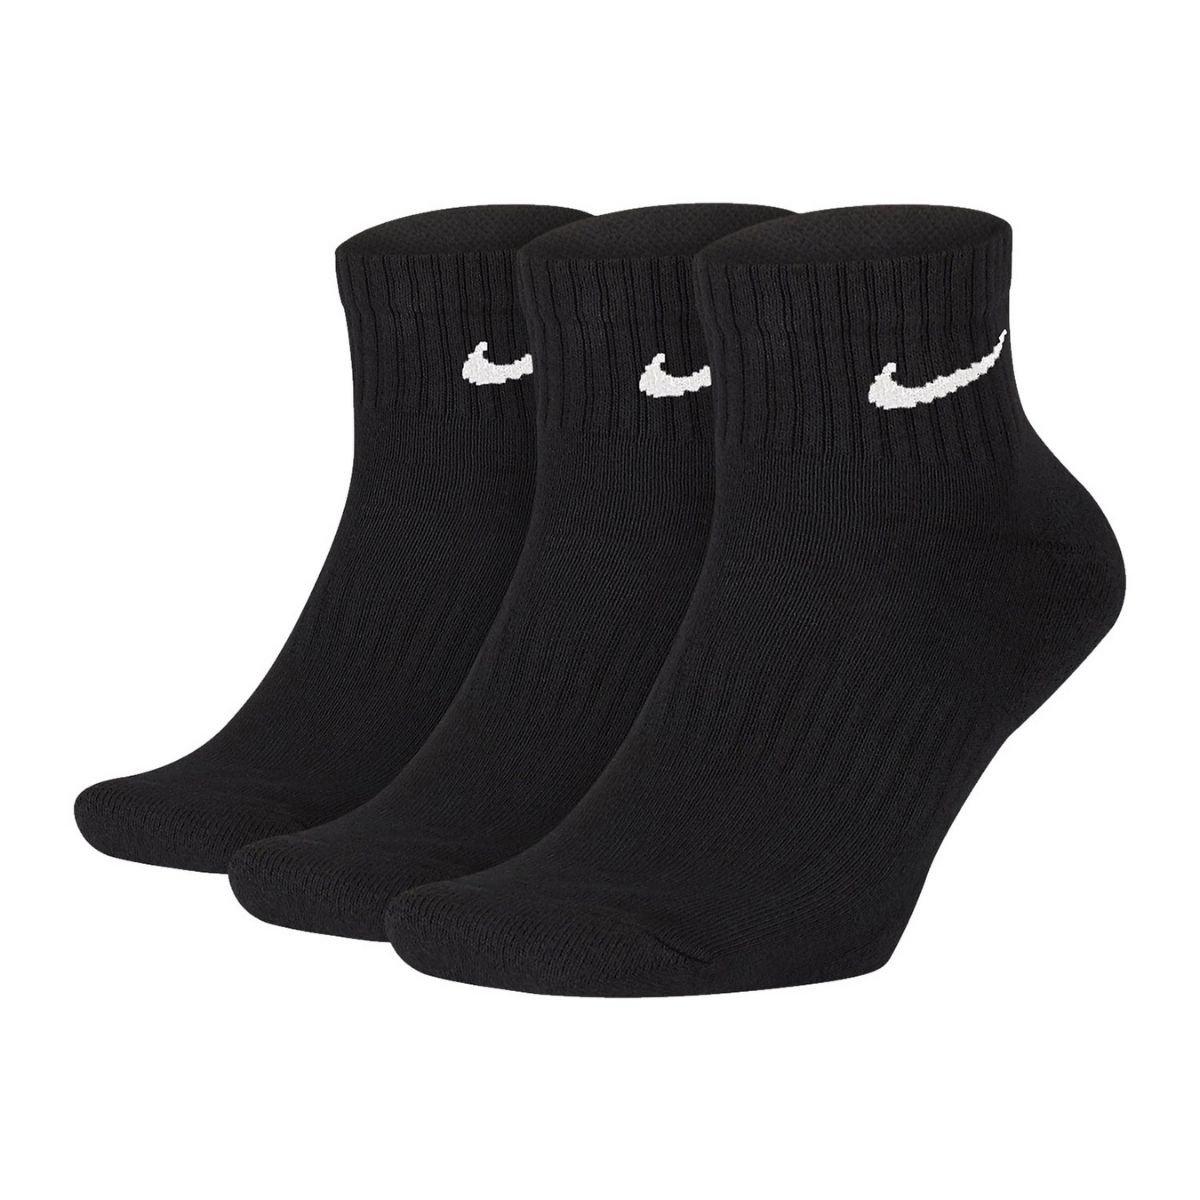 Calze Nike Everyday Cushion...